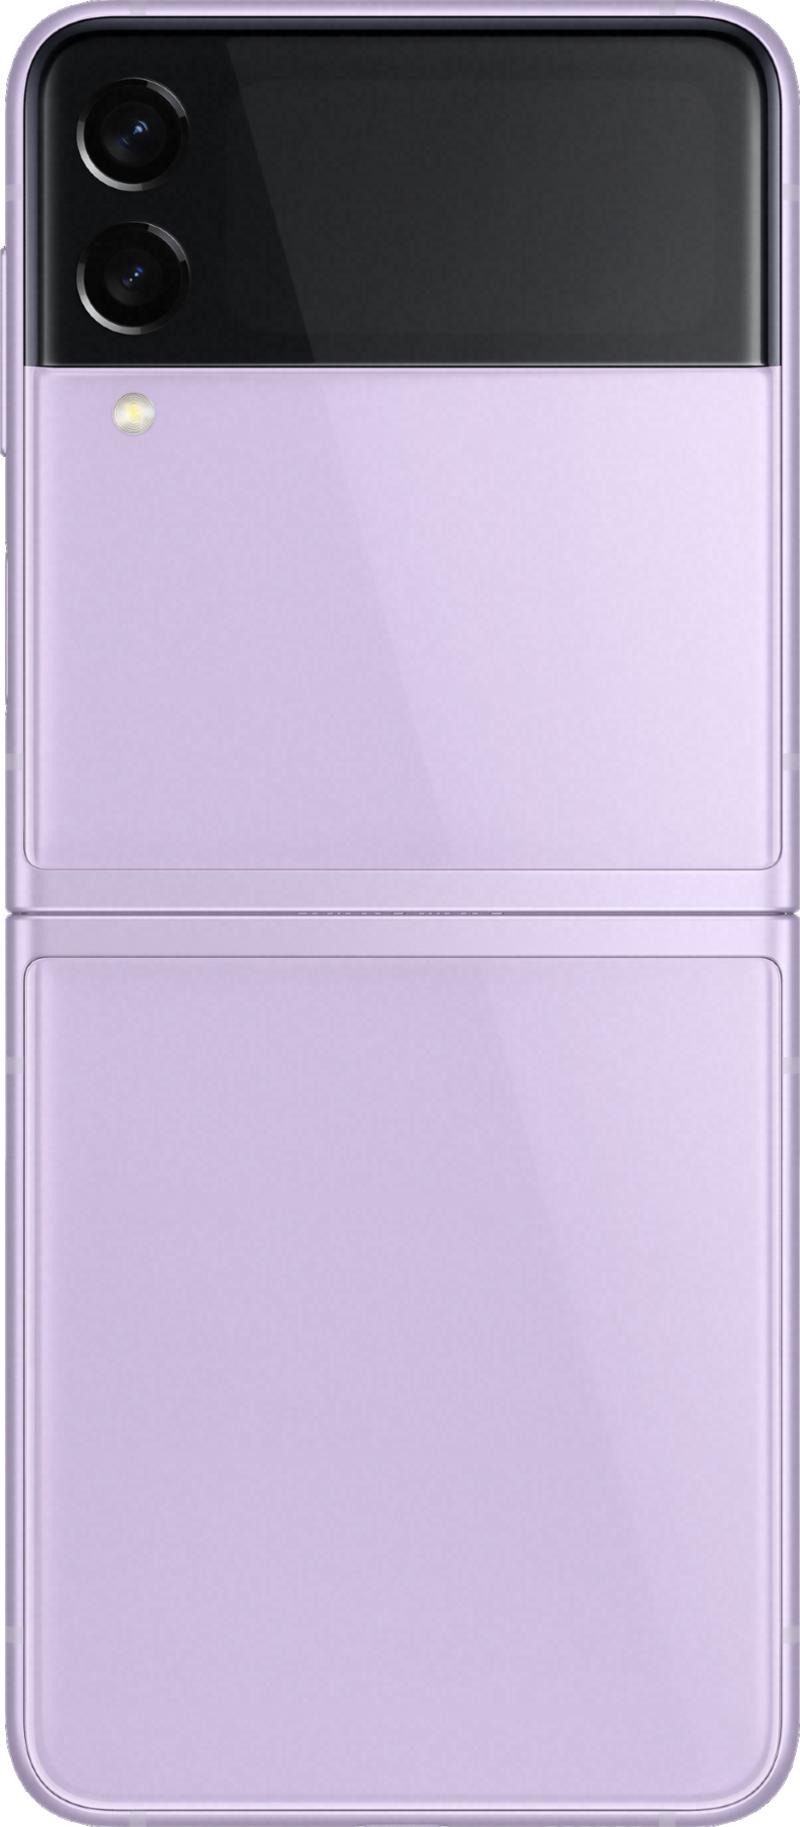 samsung-galaxy-z-flip-3-lavender.png